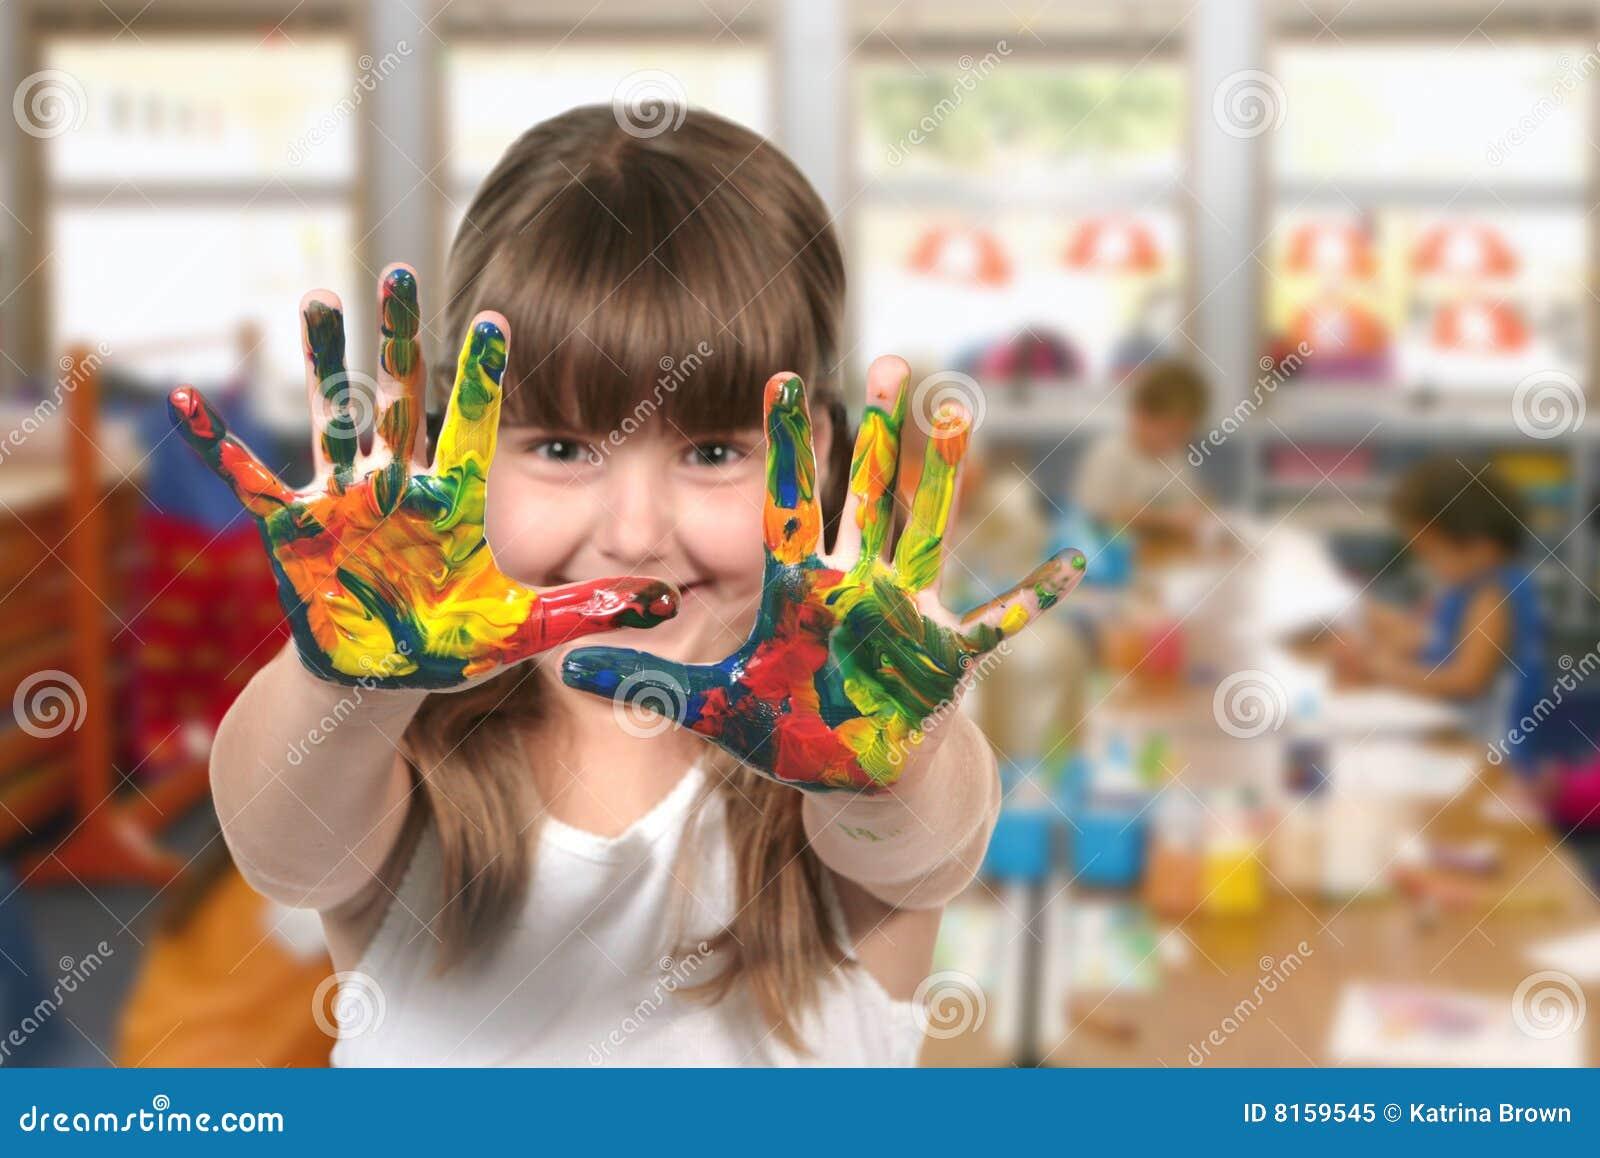 imagens jardim infancia:Kindergarten Classroom Stock Images Painting